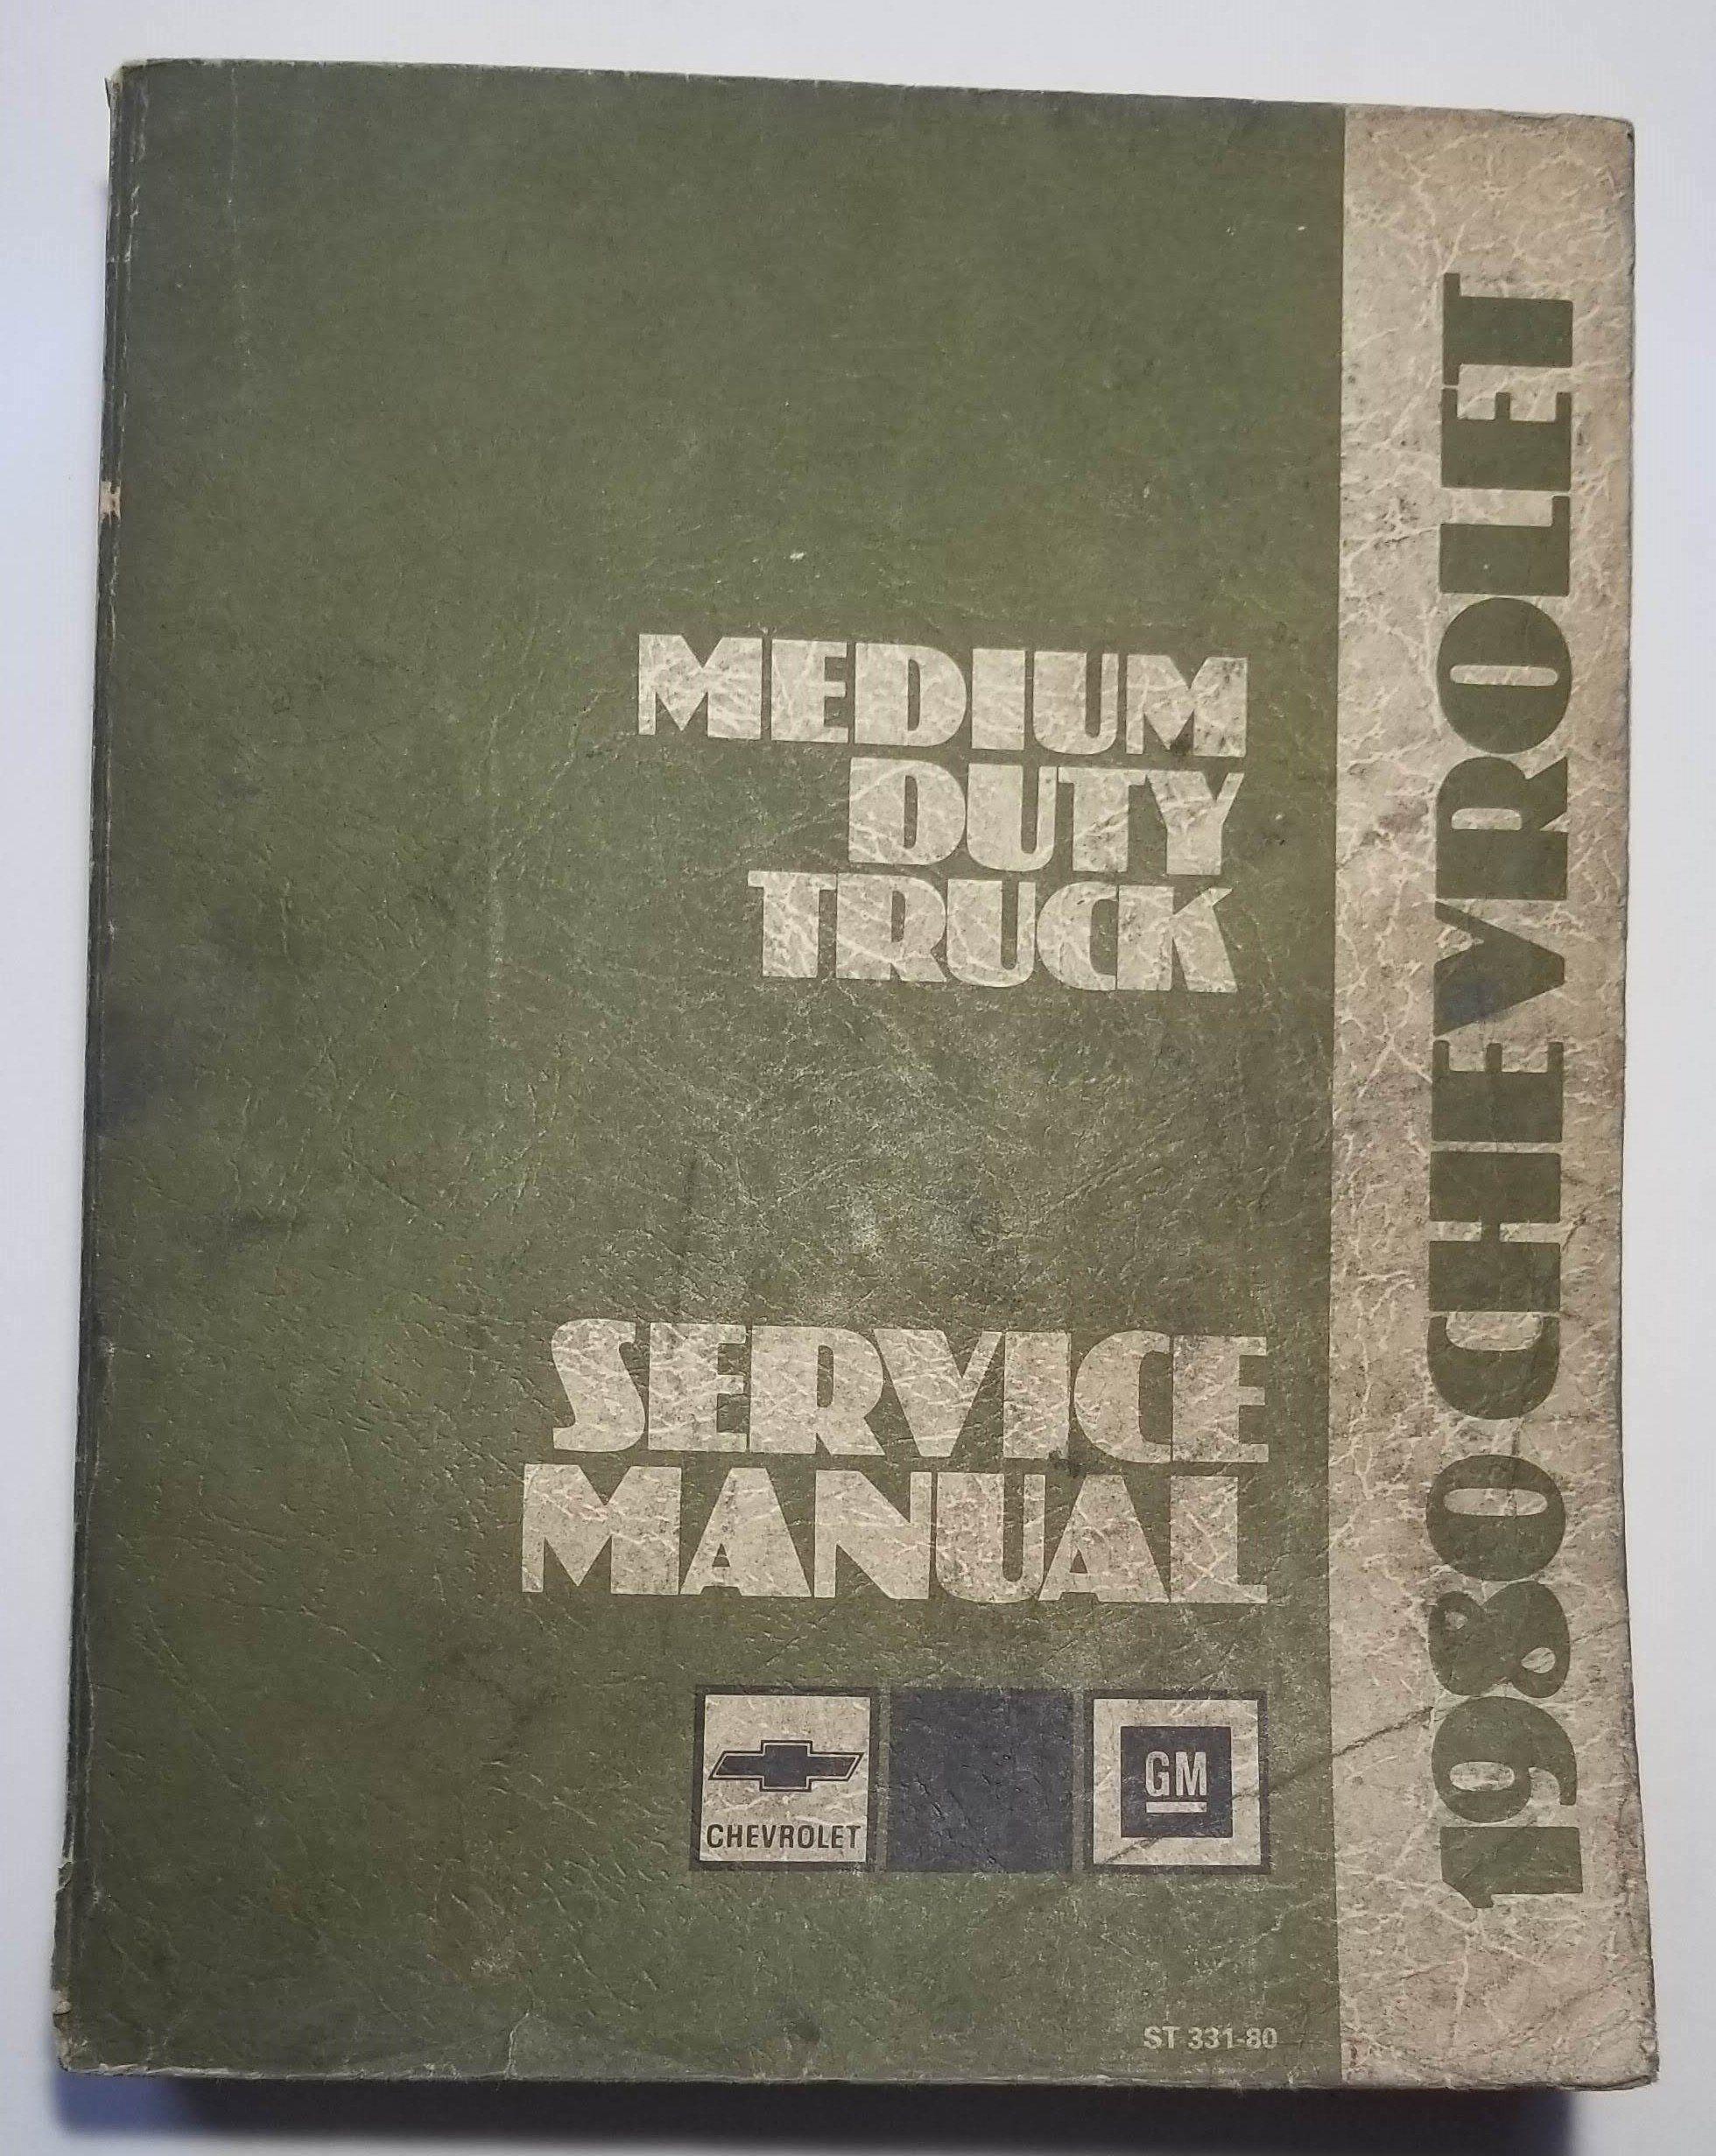 1980 Chevrolet Medium Duty Truck Service Manual Vintage ST331-80 by  VannaBsVintage on Etsy